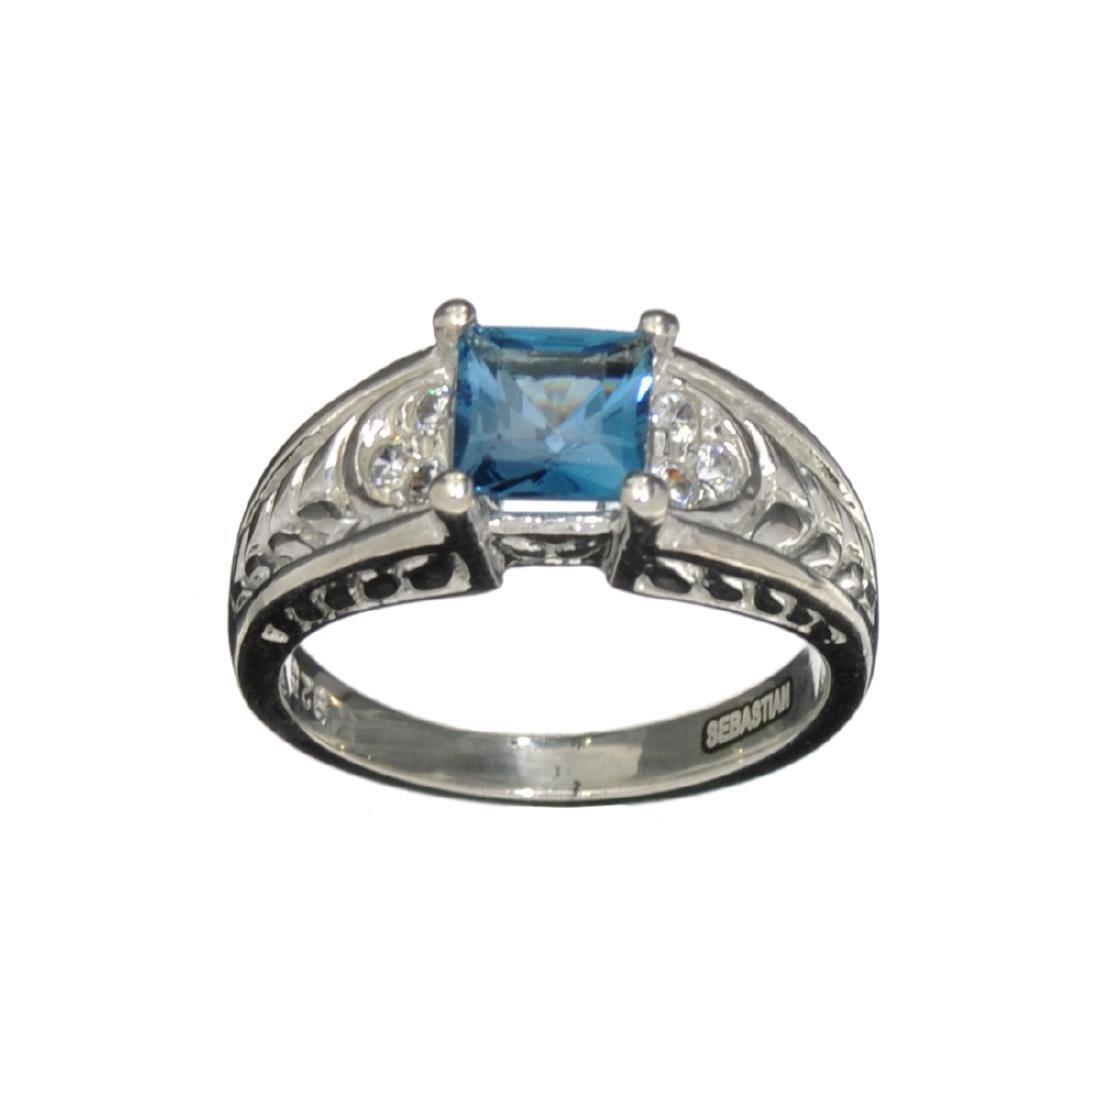 APP: 0.5k Fine Jewelry Designer Sebastian, 1.90CT